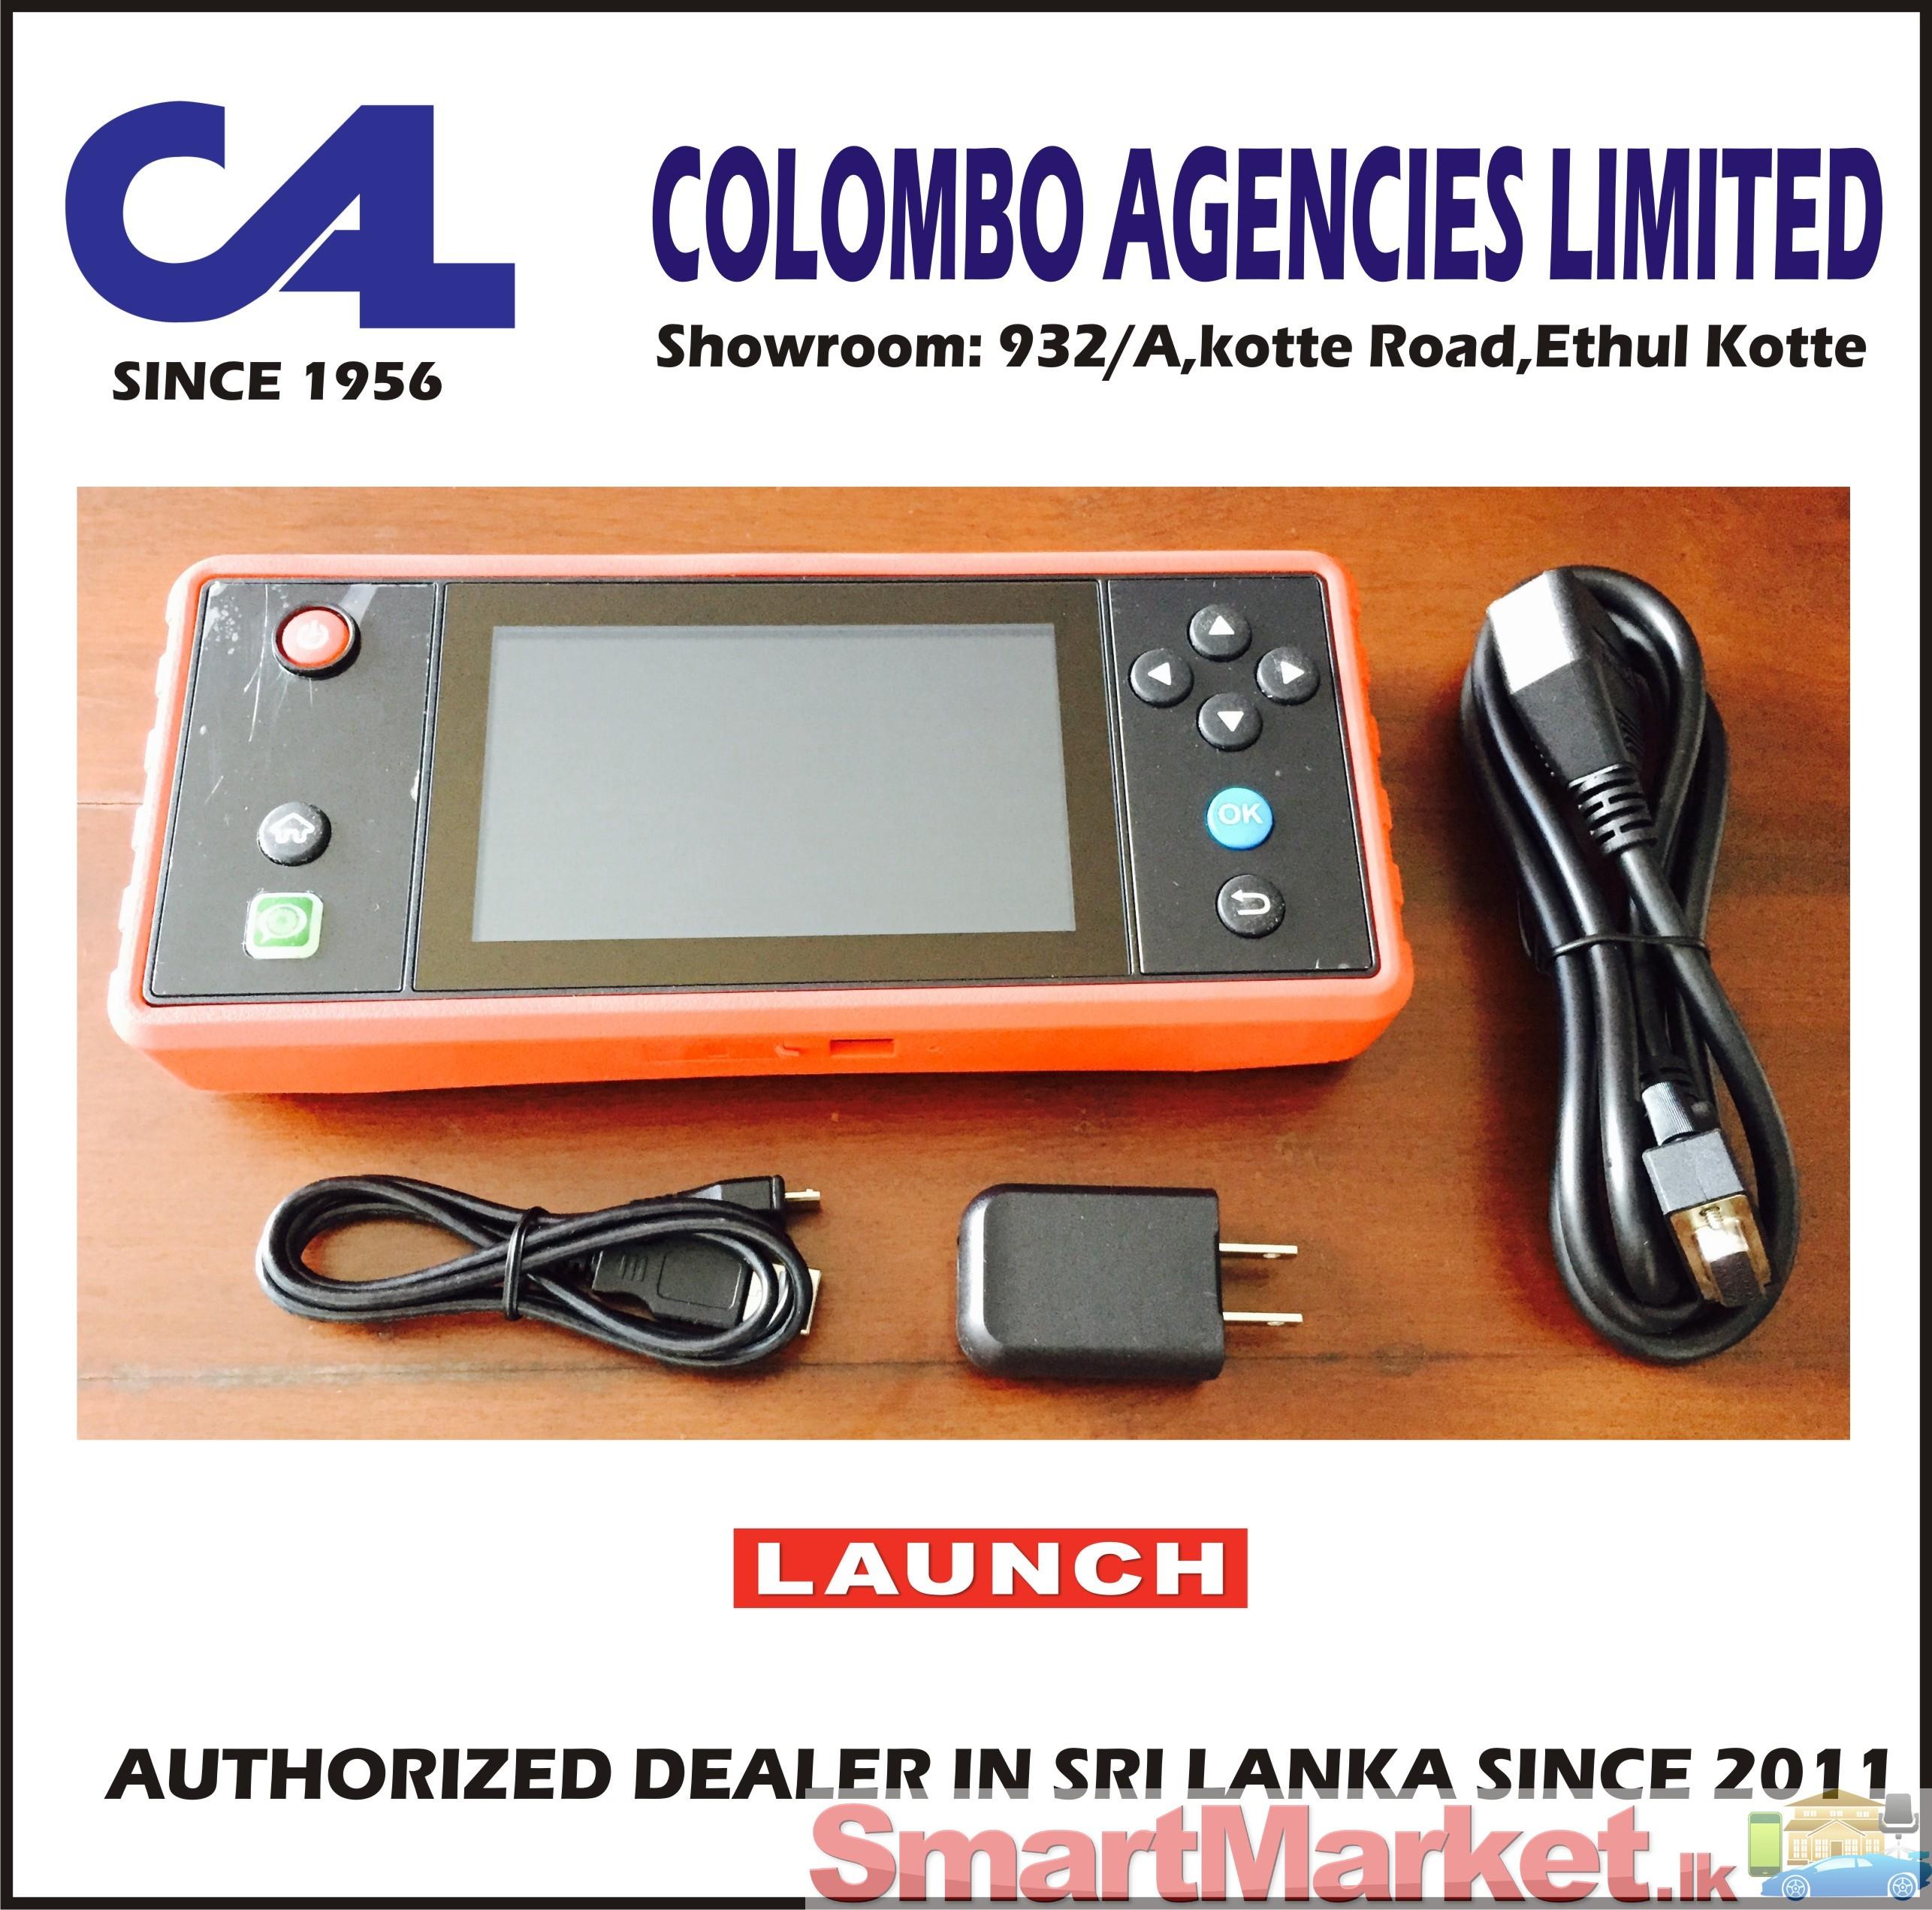 launch scanner crp 229 scan tool. Black Bedroom Furniture Sets. Home Design Ideas